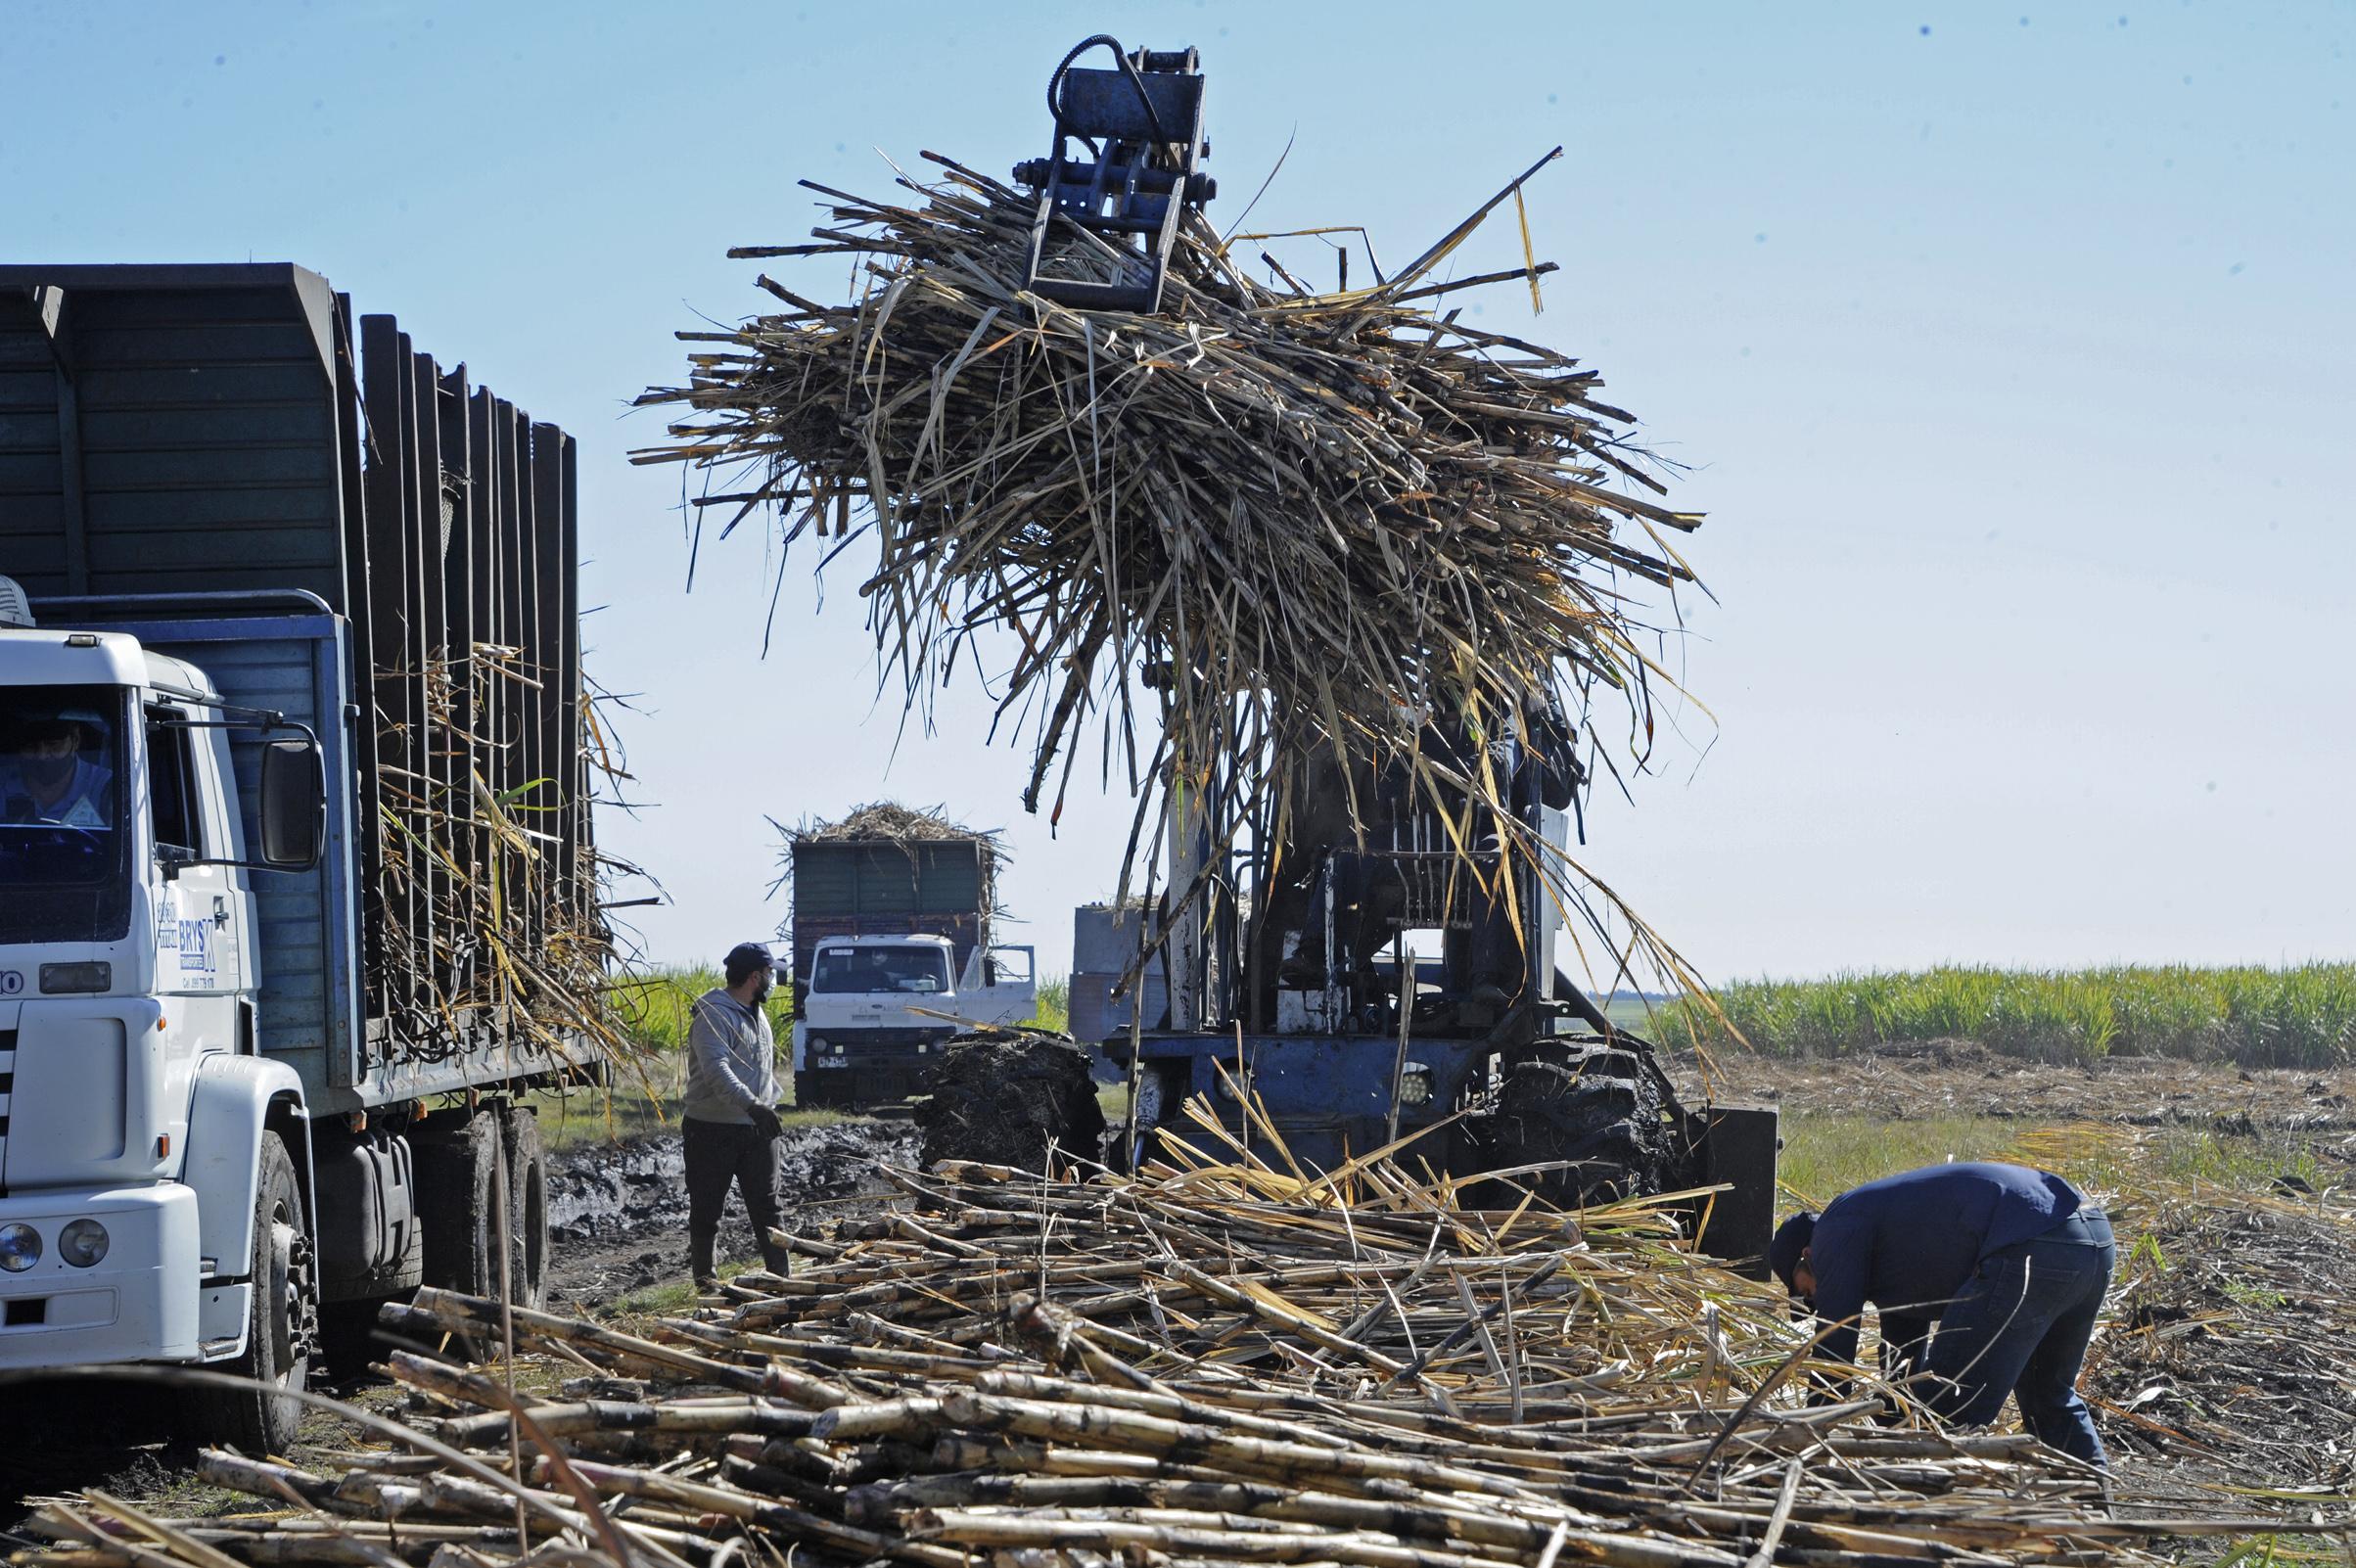 Cosecha de caña de azúcar en Bella Unión